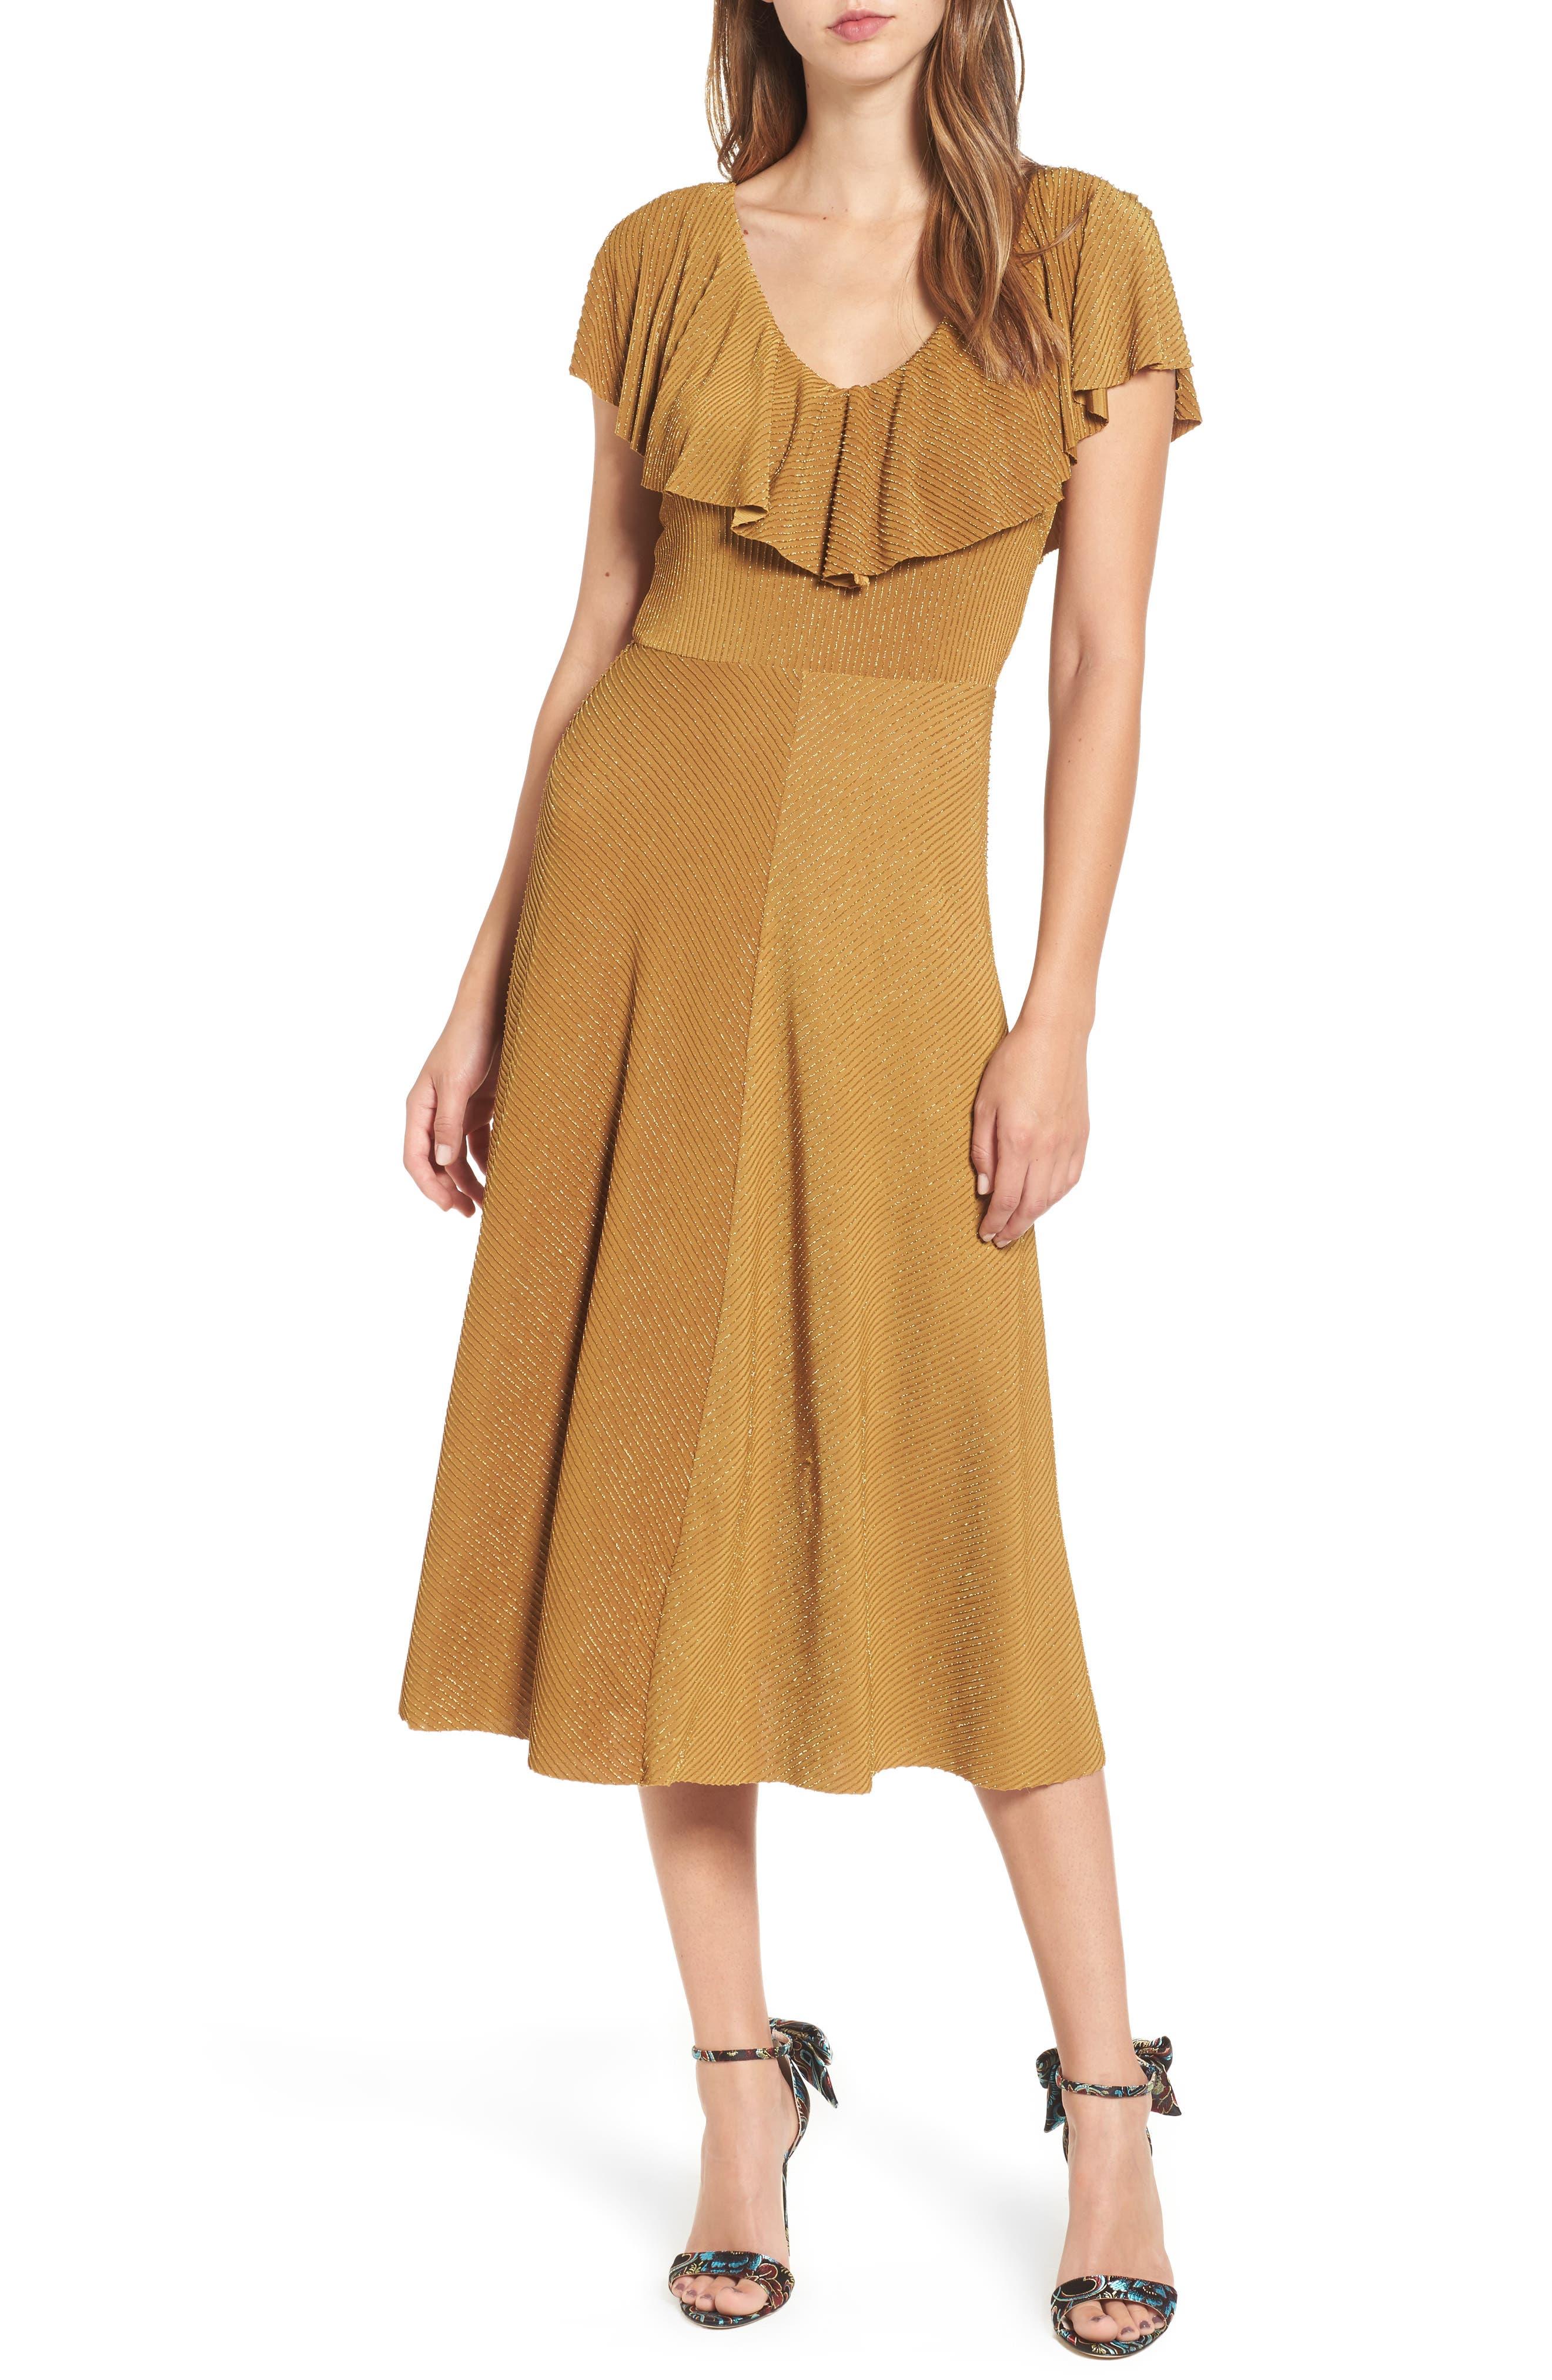 Alternate Image 1 Selected - June & Hudson Ruffle Midi Dress